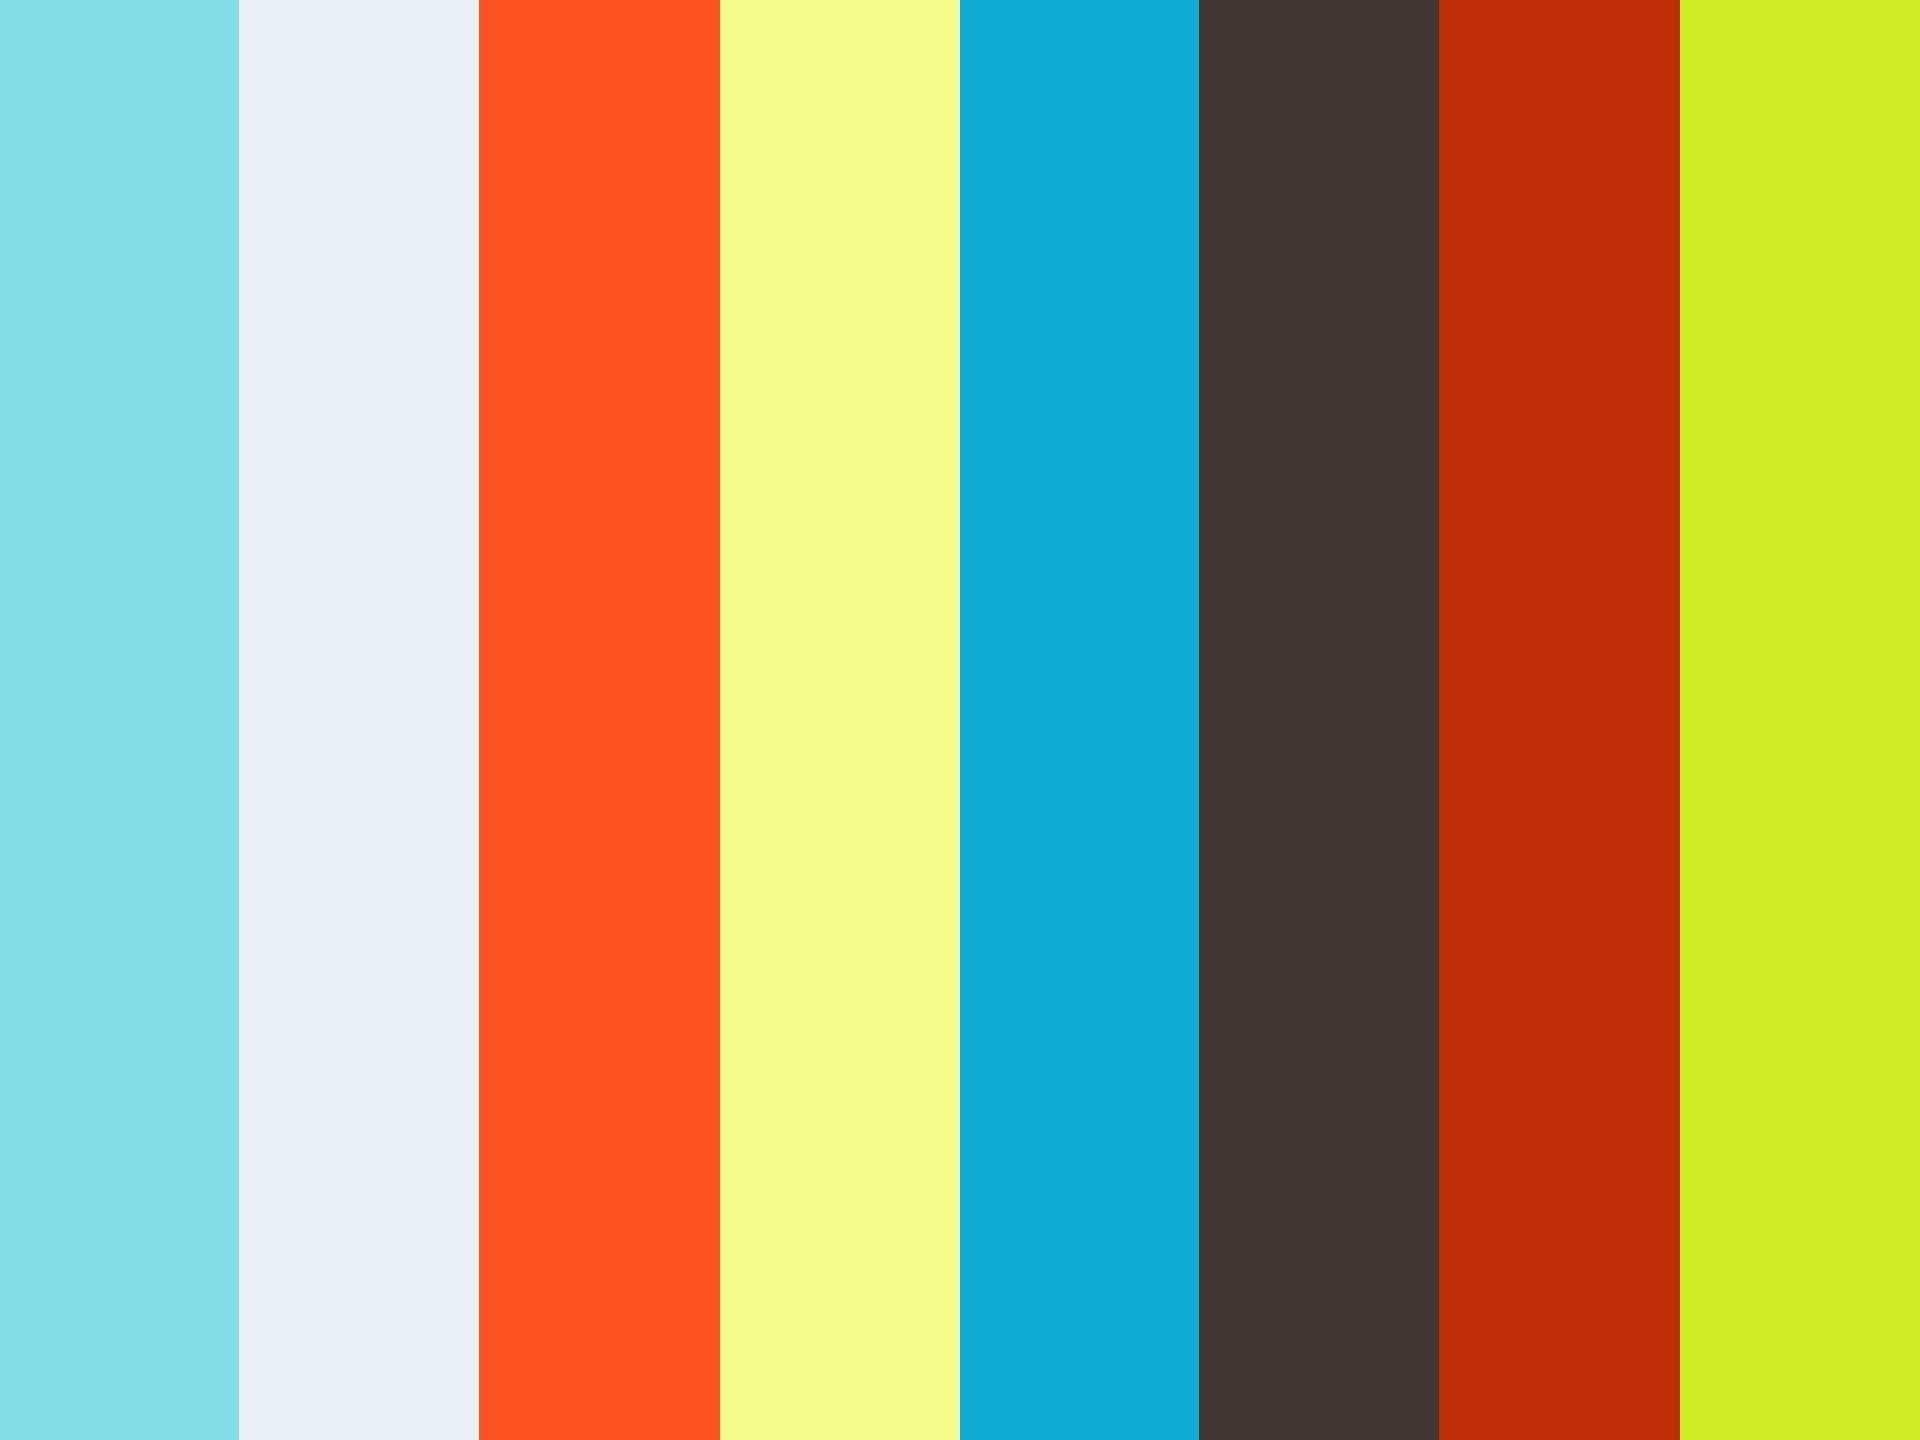 【special】内山徹哉先生:⑩クラウン修復の心臓であるプロビジョナルレストレーション 〜その役割と補綴前処置の必要性 印象採得法まで〜 #8